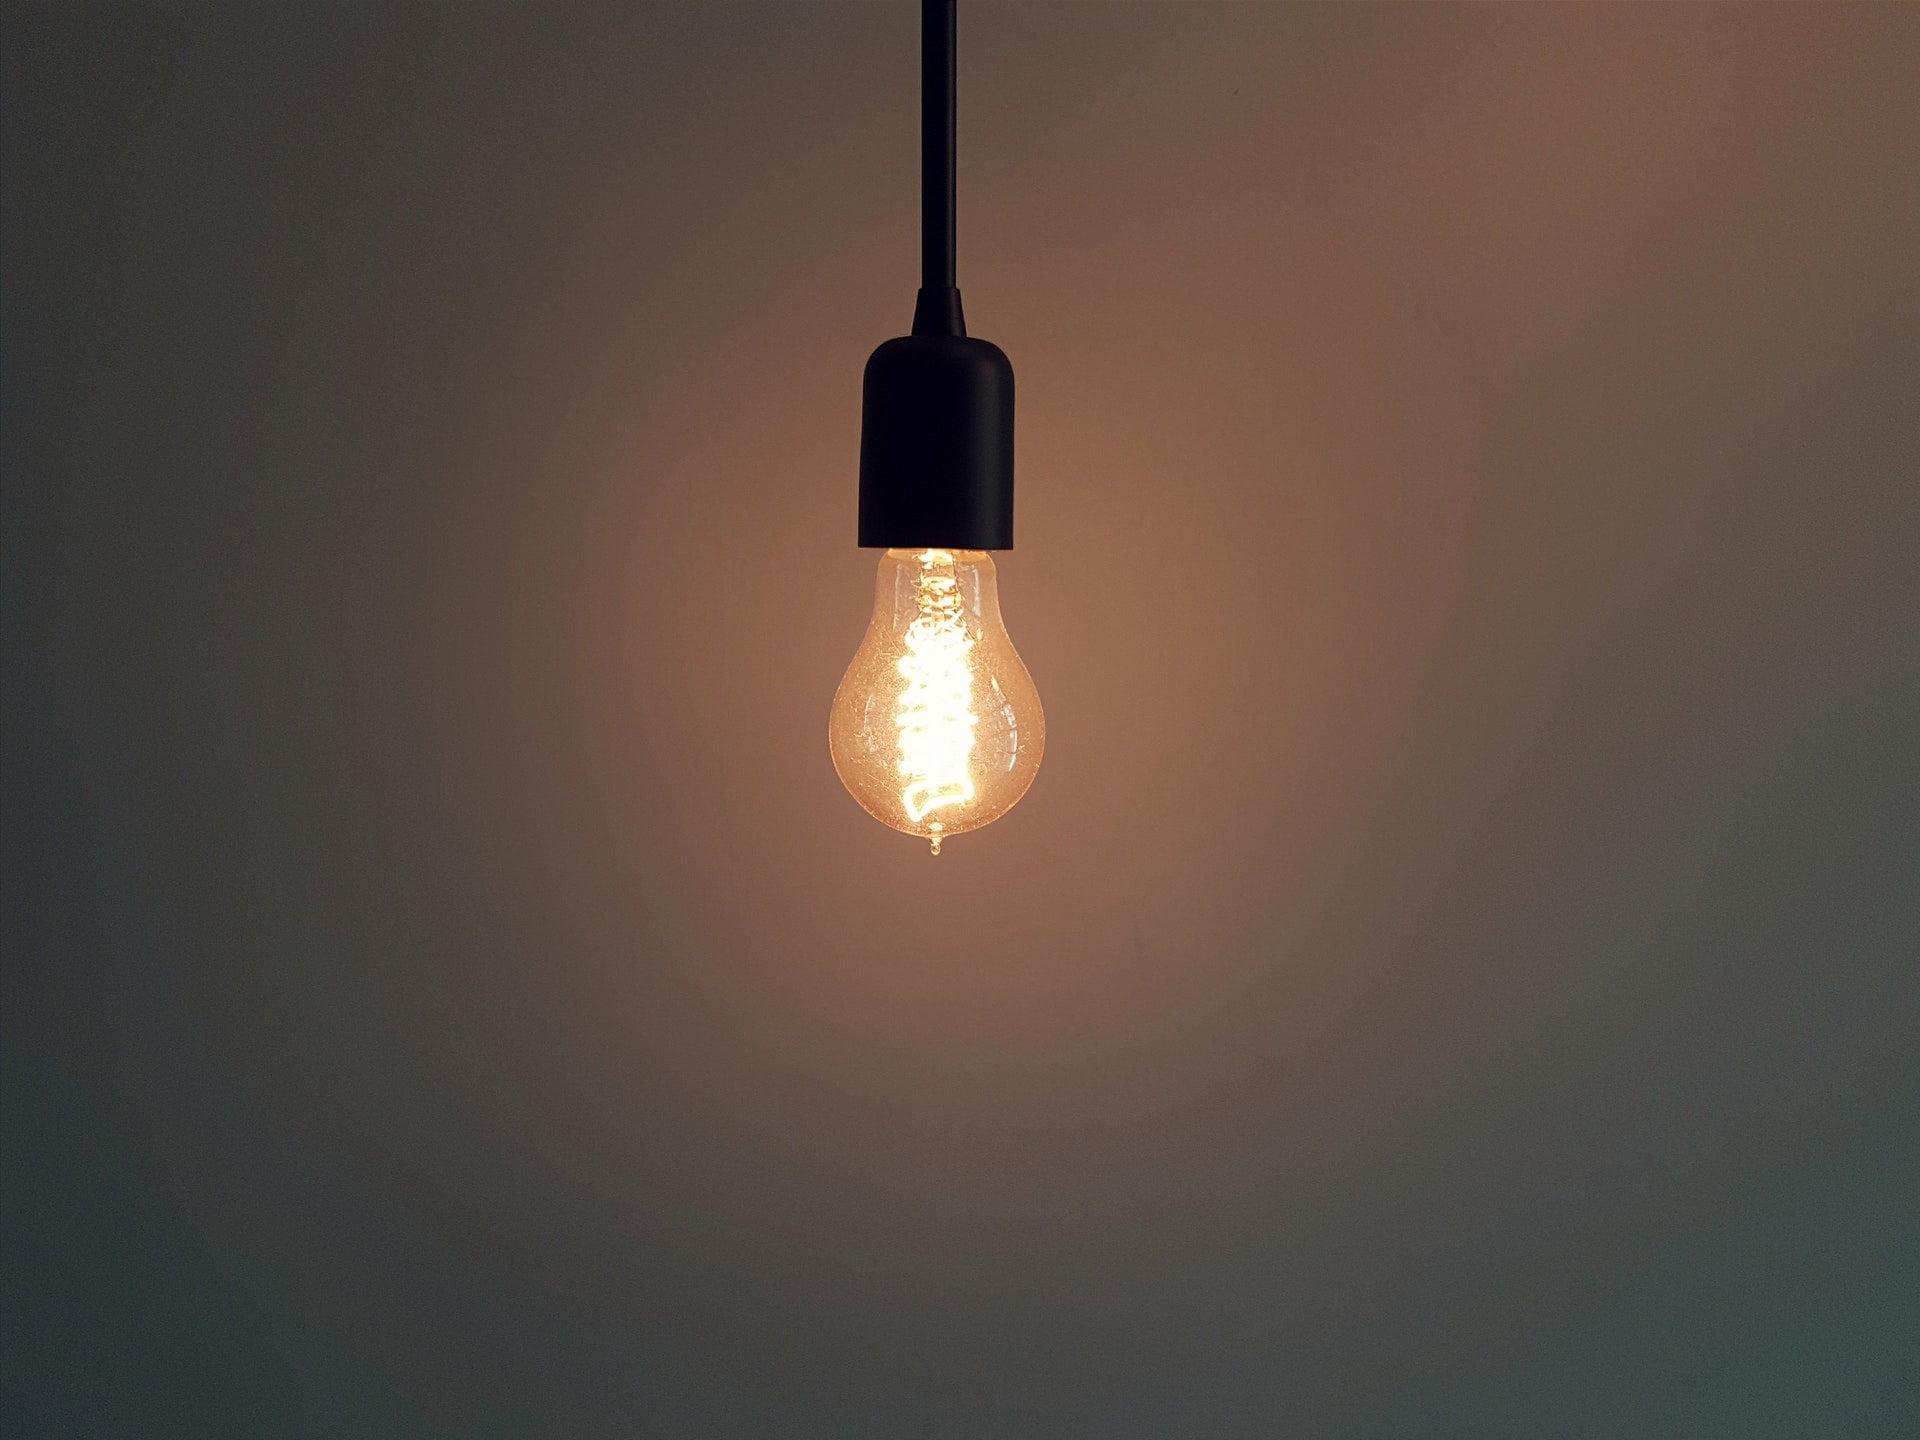 ideas de pymes innovadoras